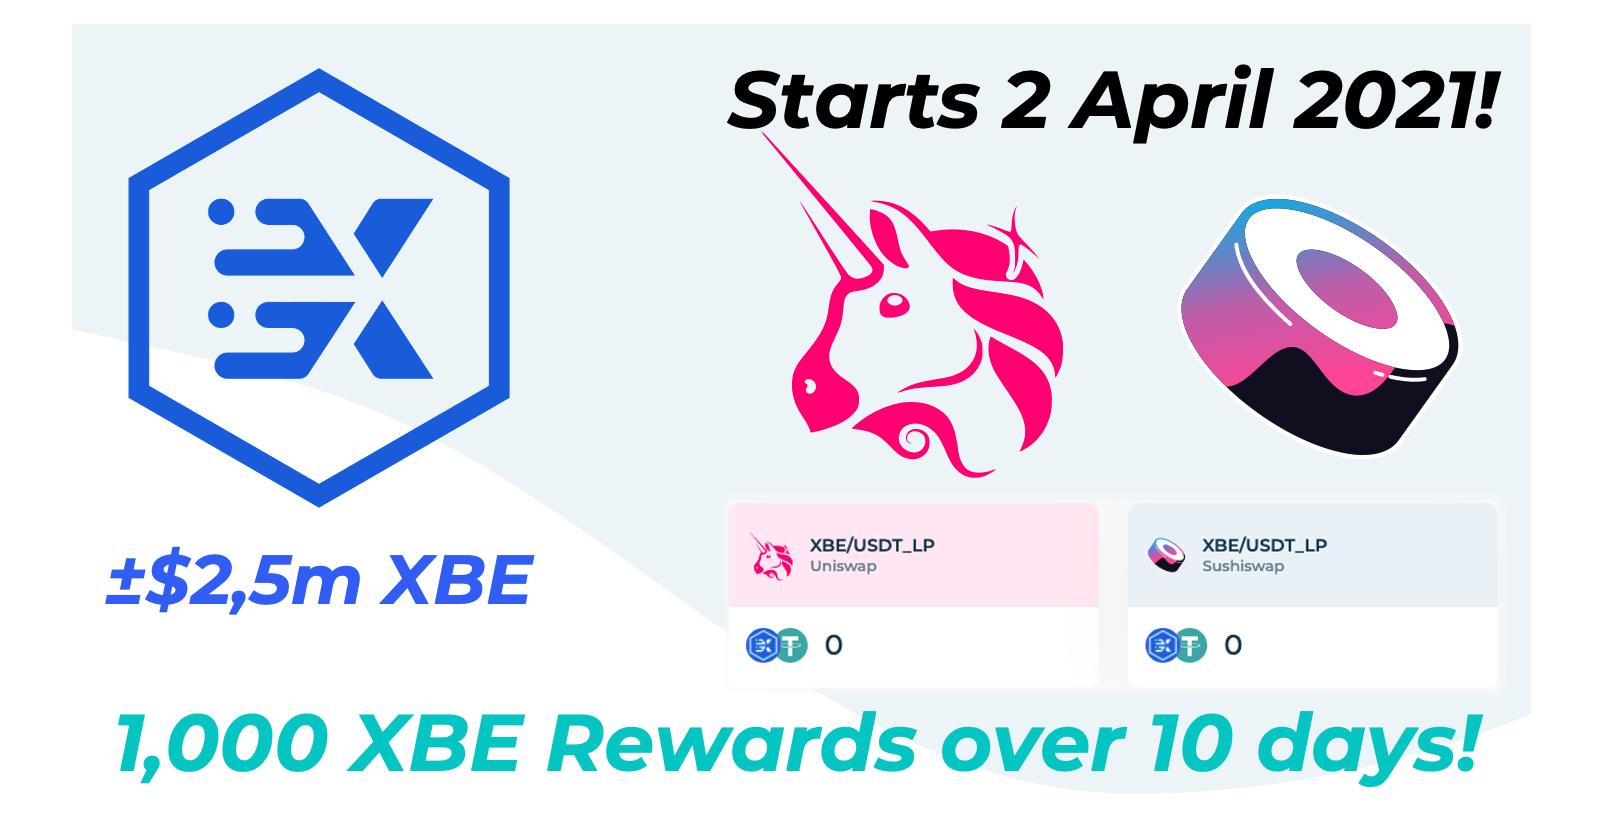 The big XBE liquidity reward starts ~9am UTC Friday 2 April 2021!